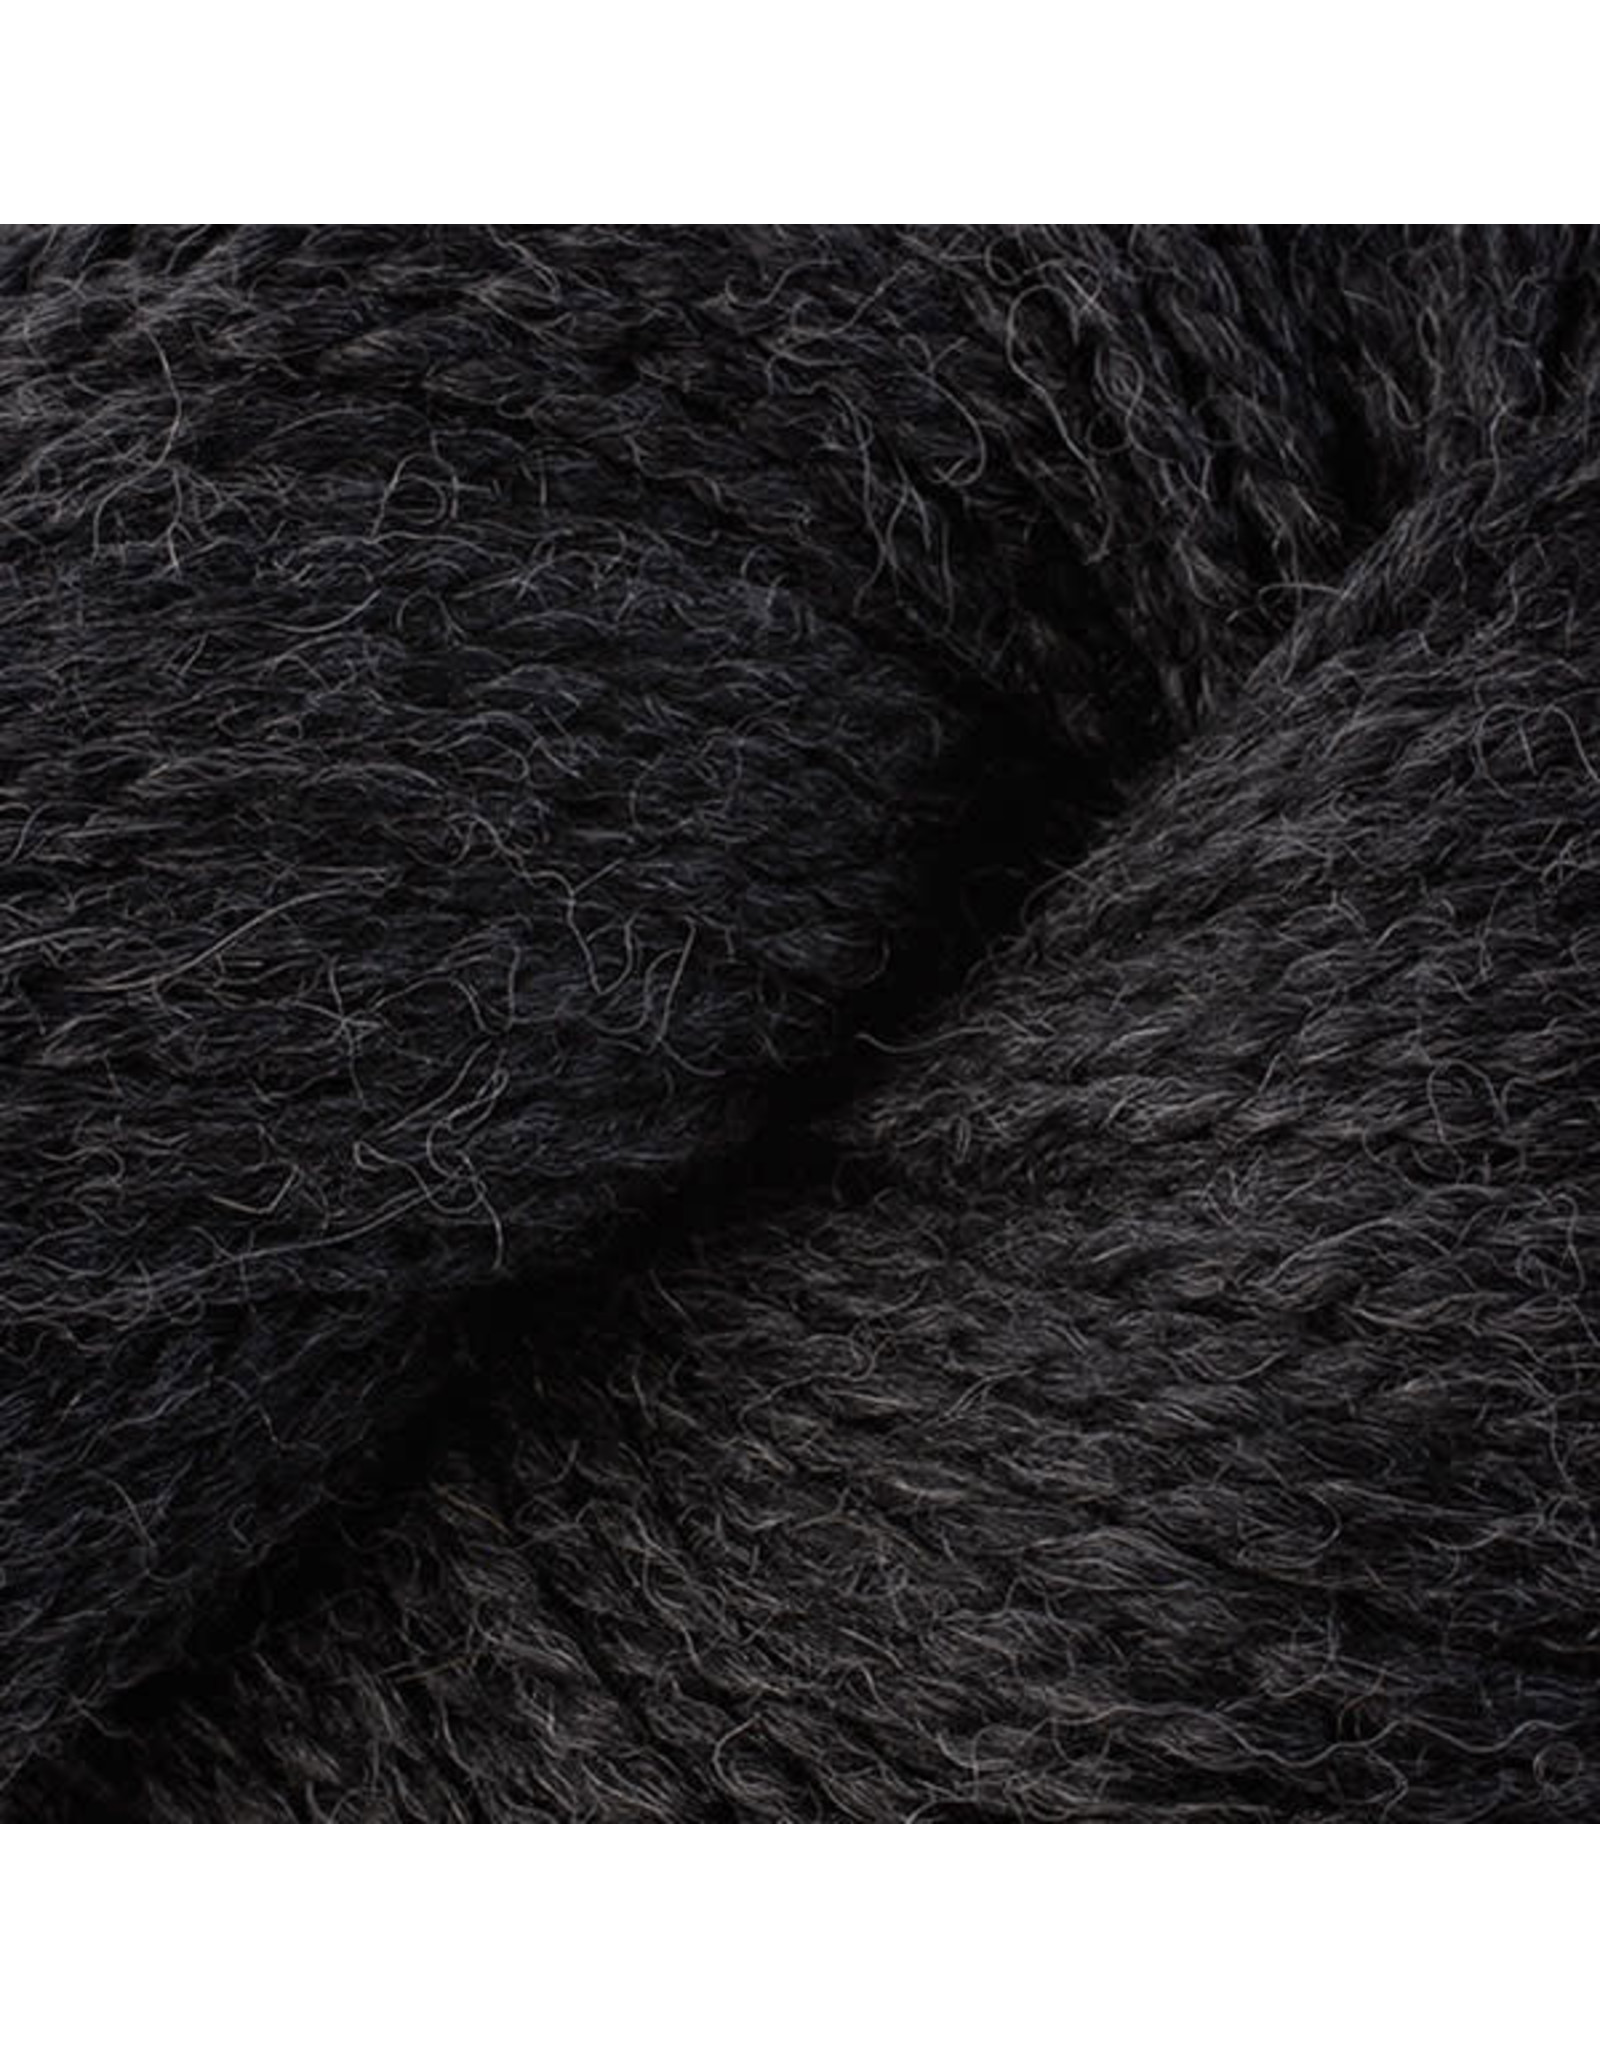 7289 Charcoal Mix - Ultra Alpaca Chunky - Berroco